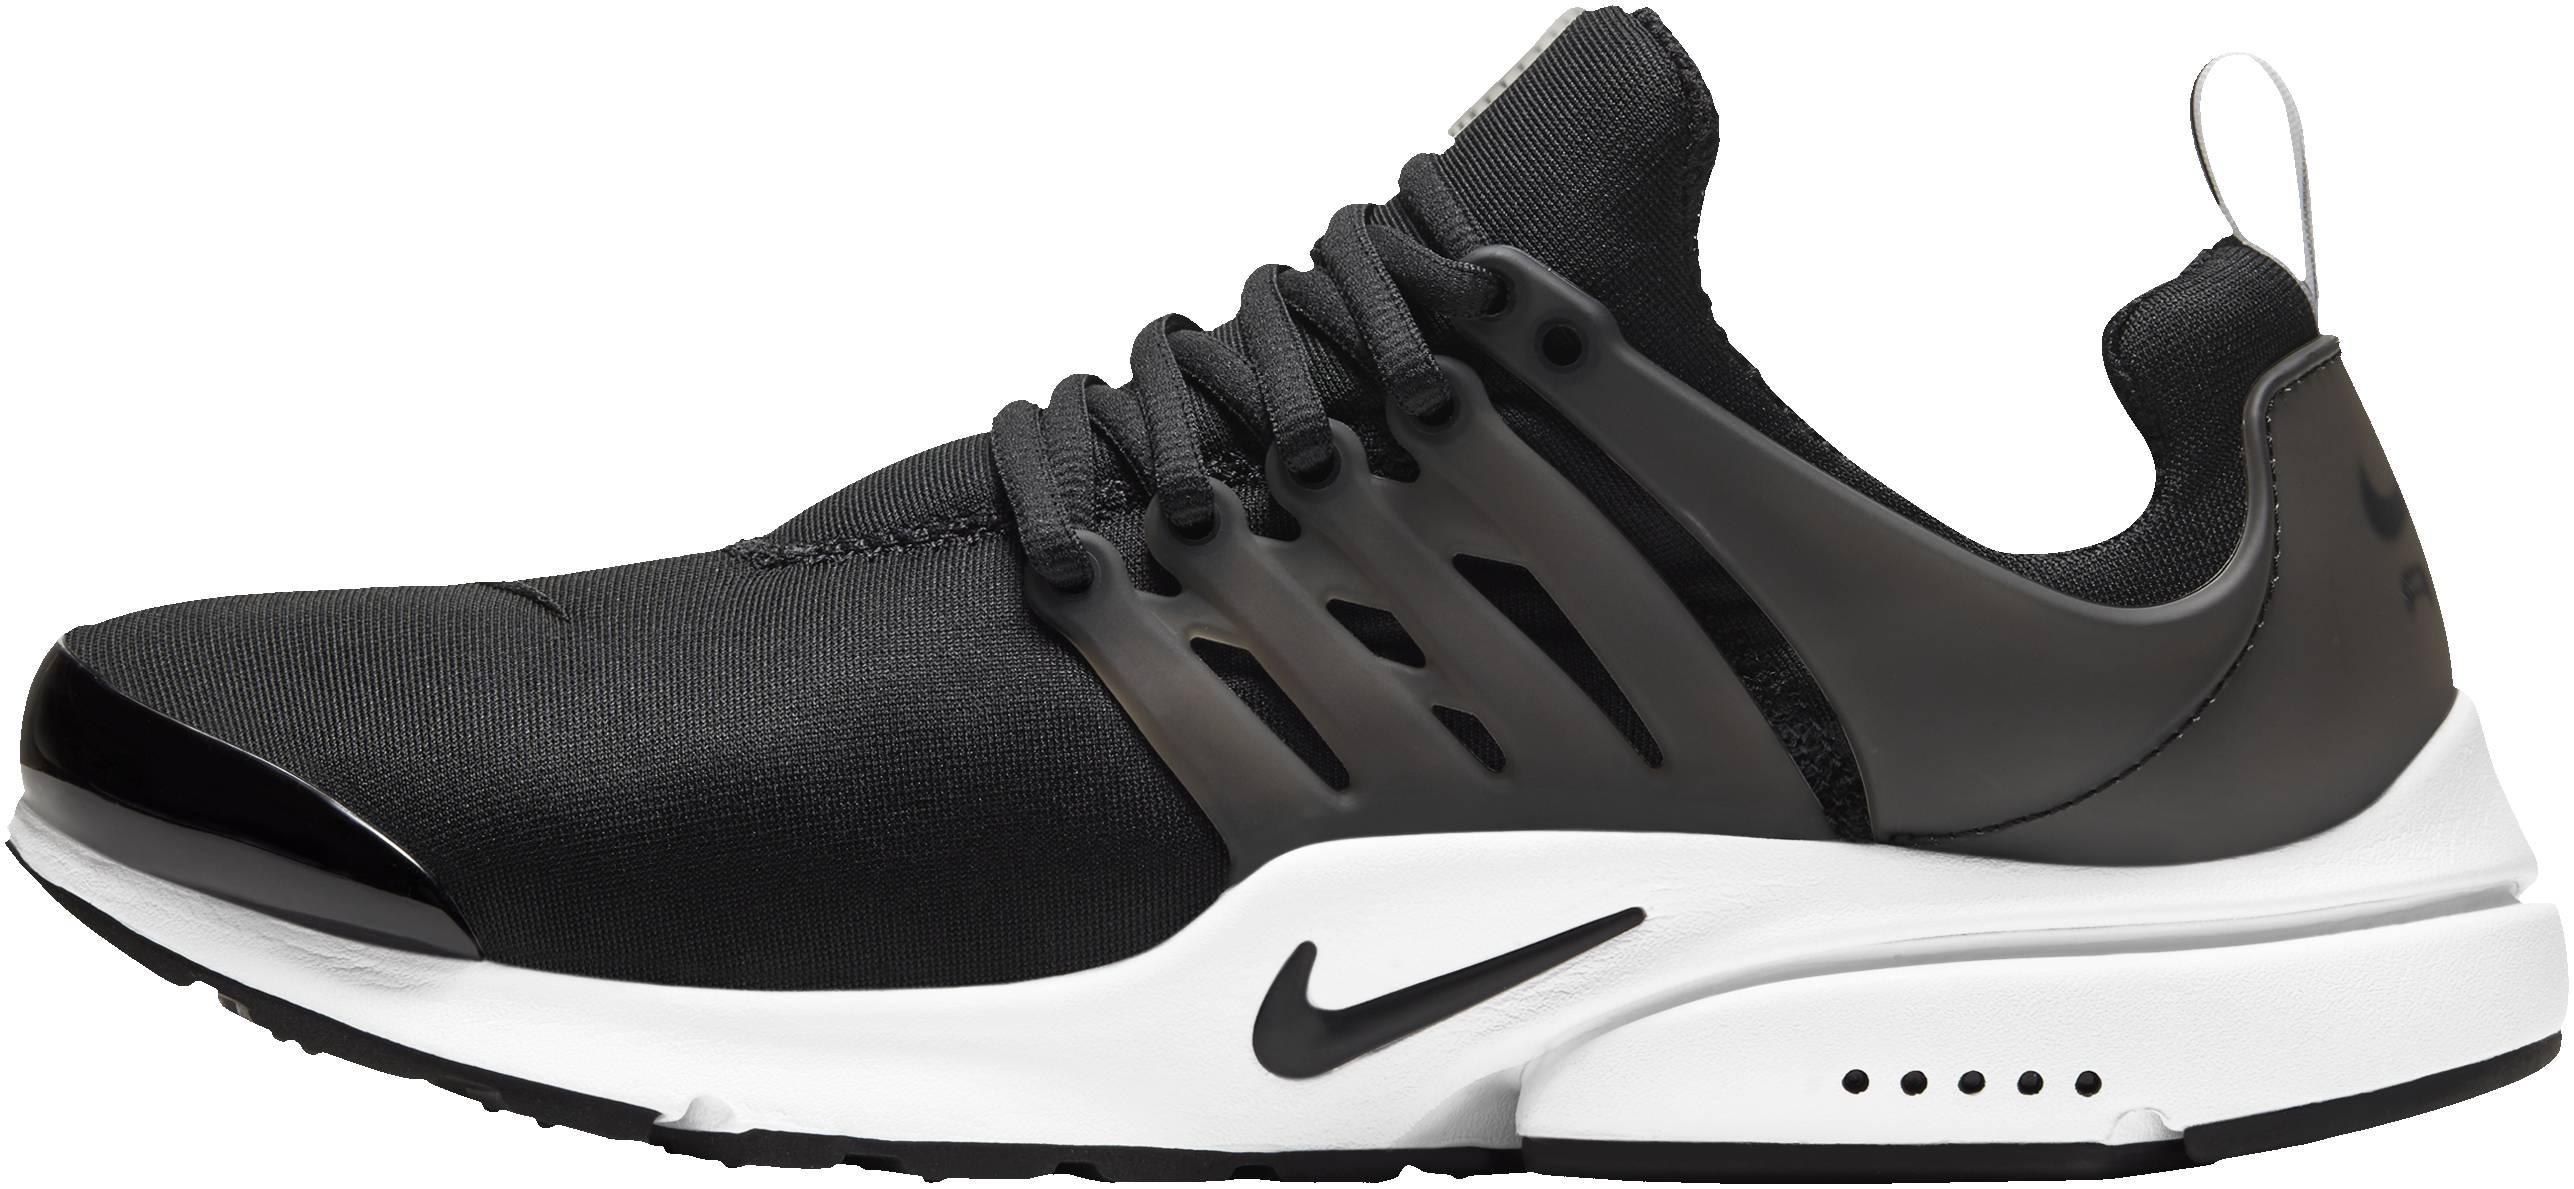 Nike Air Presto sneakers in 9 colors (only $90) | RunRepeat